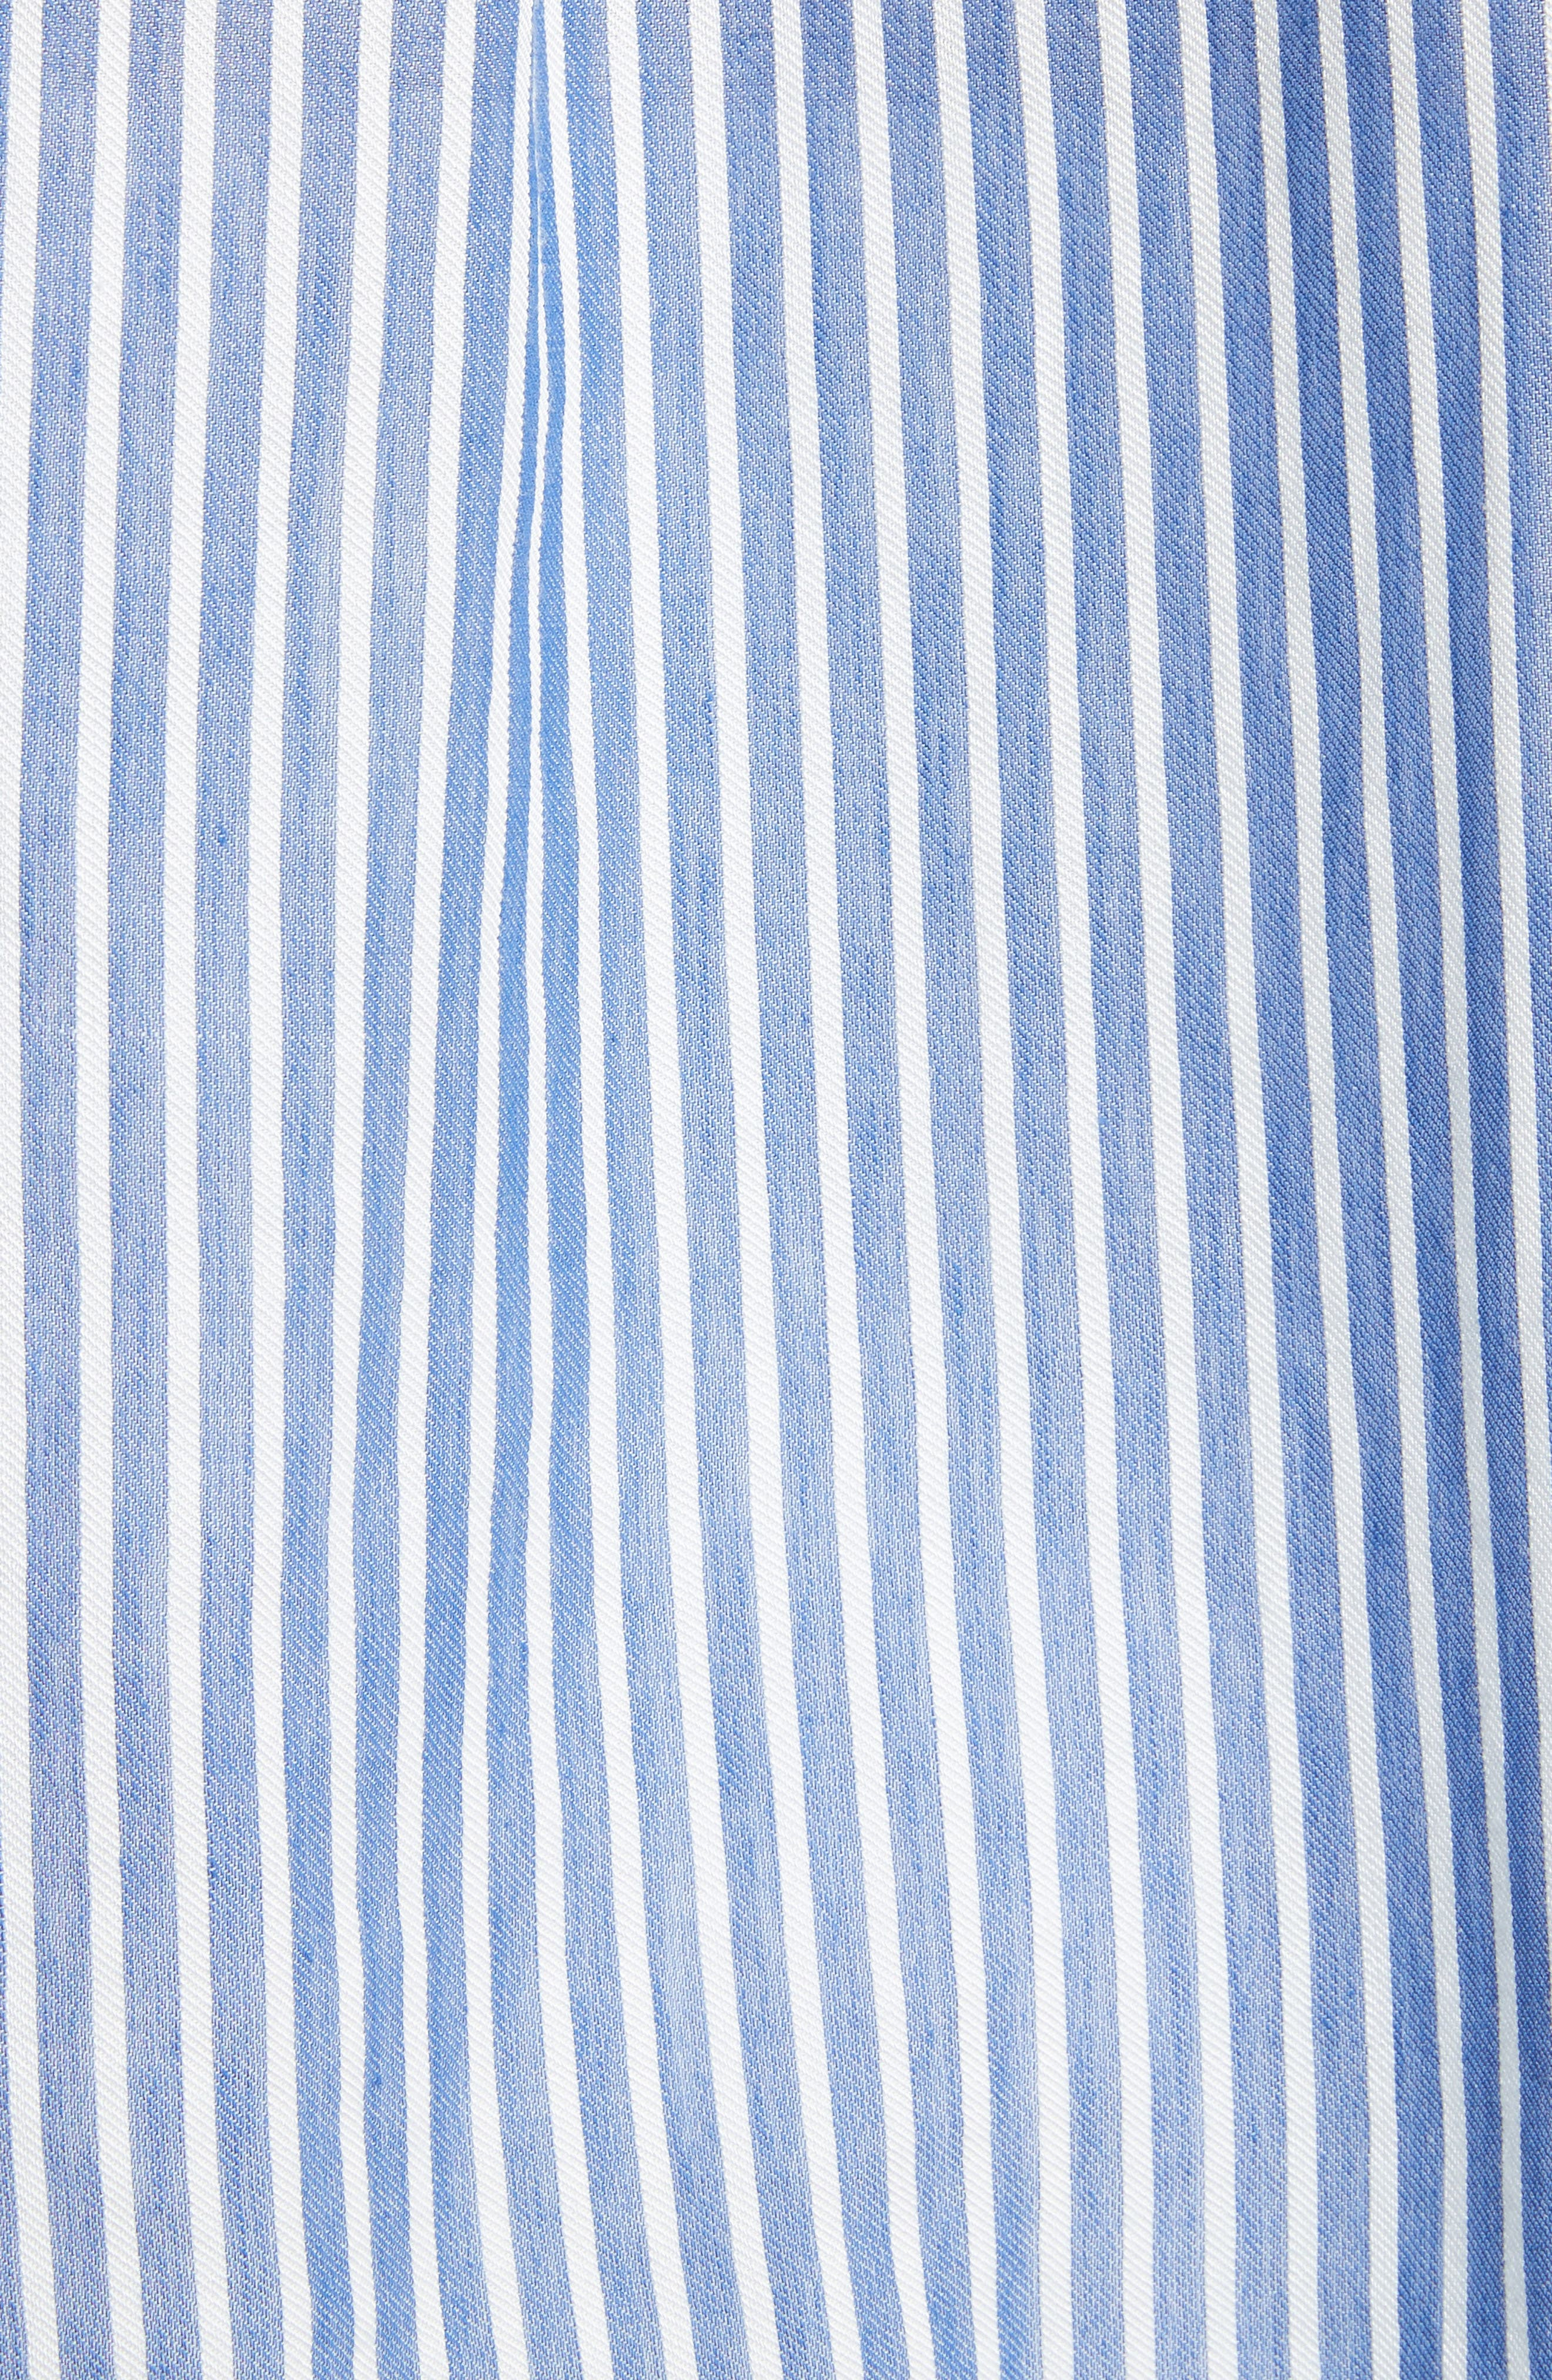 Classic Stripe Cotton Blend Tunic,                             Alternate thumbnail 5, color,                             White/ Blue